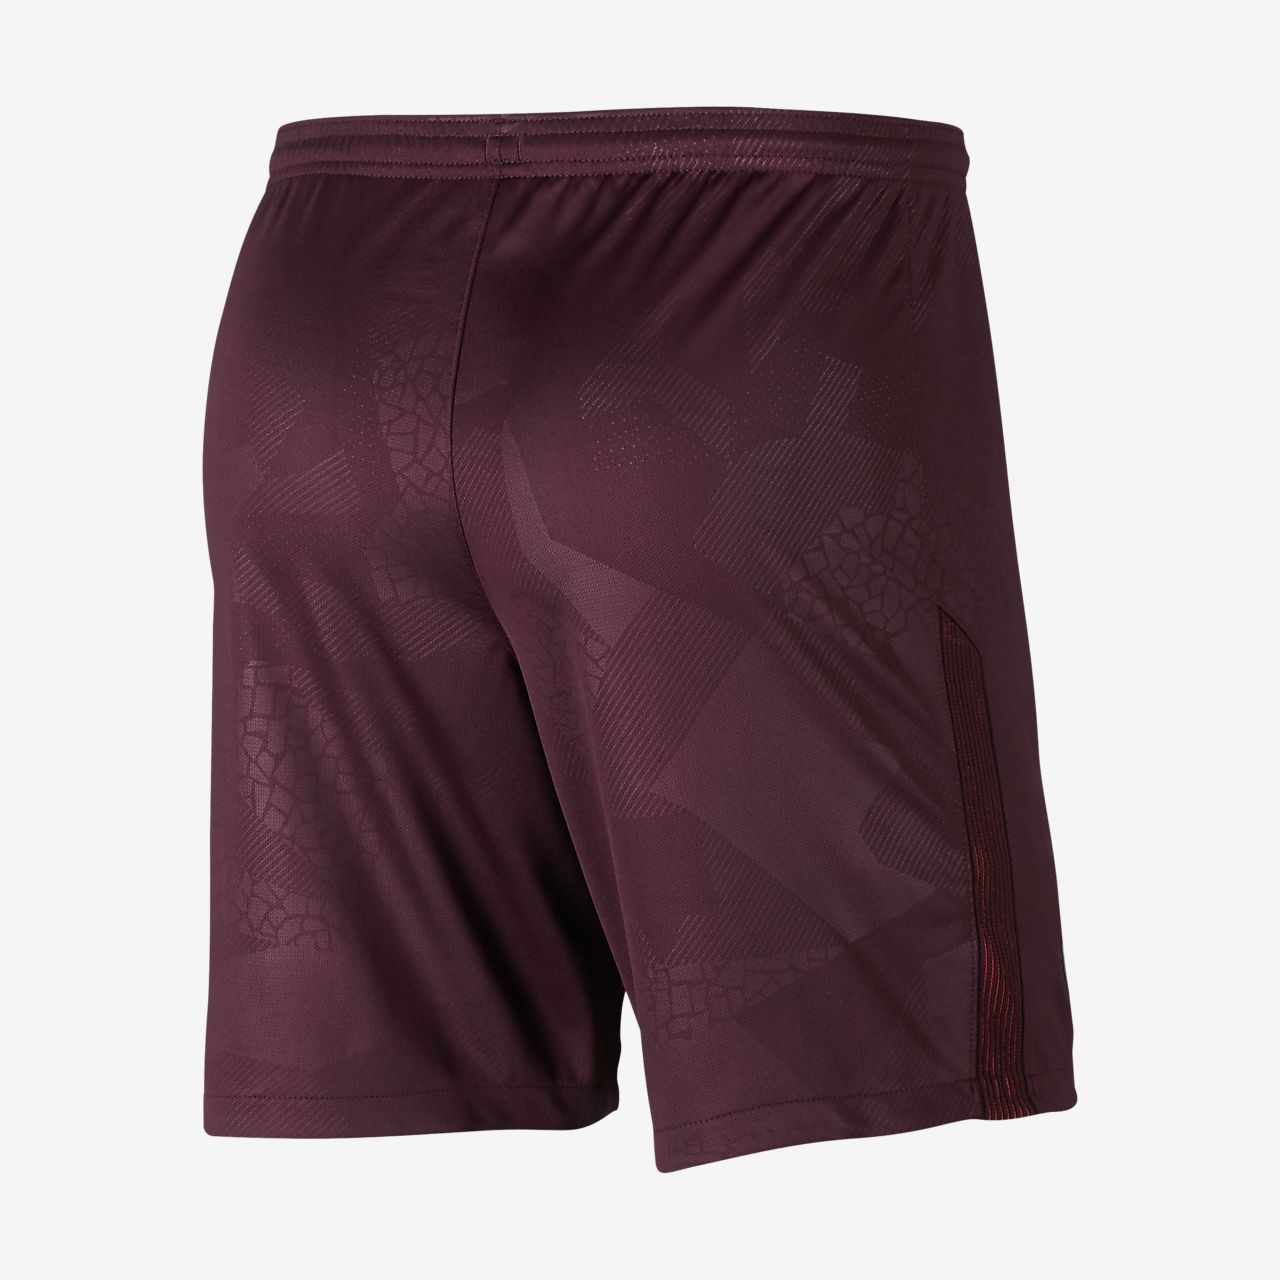 ... 2017/18 FC Barcelona Stadium Third Men's Football Shorts